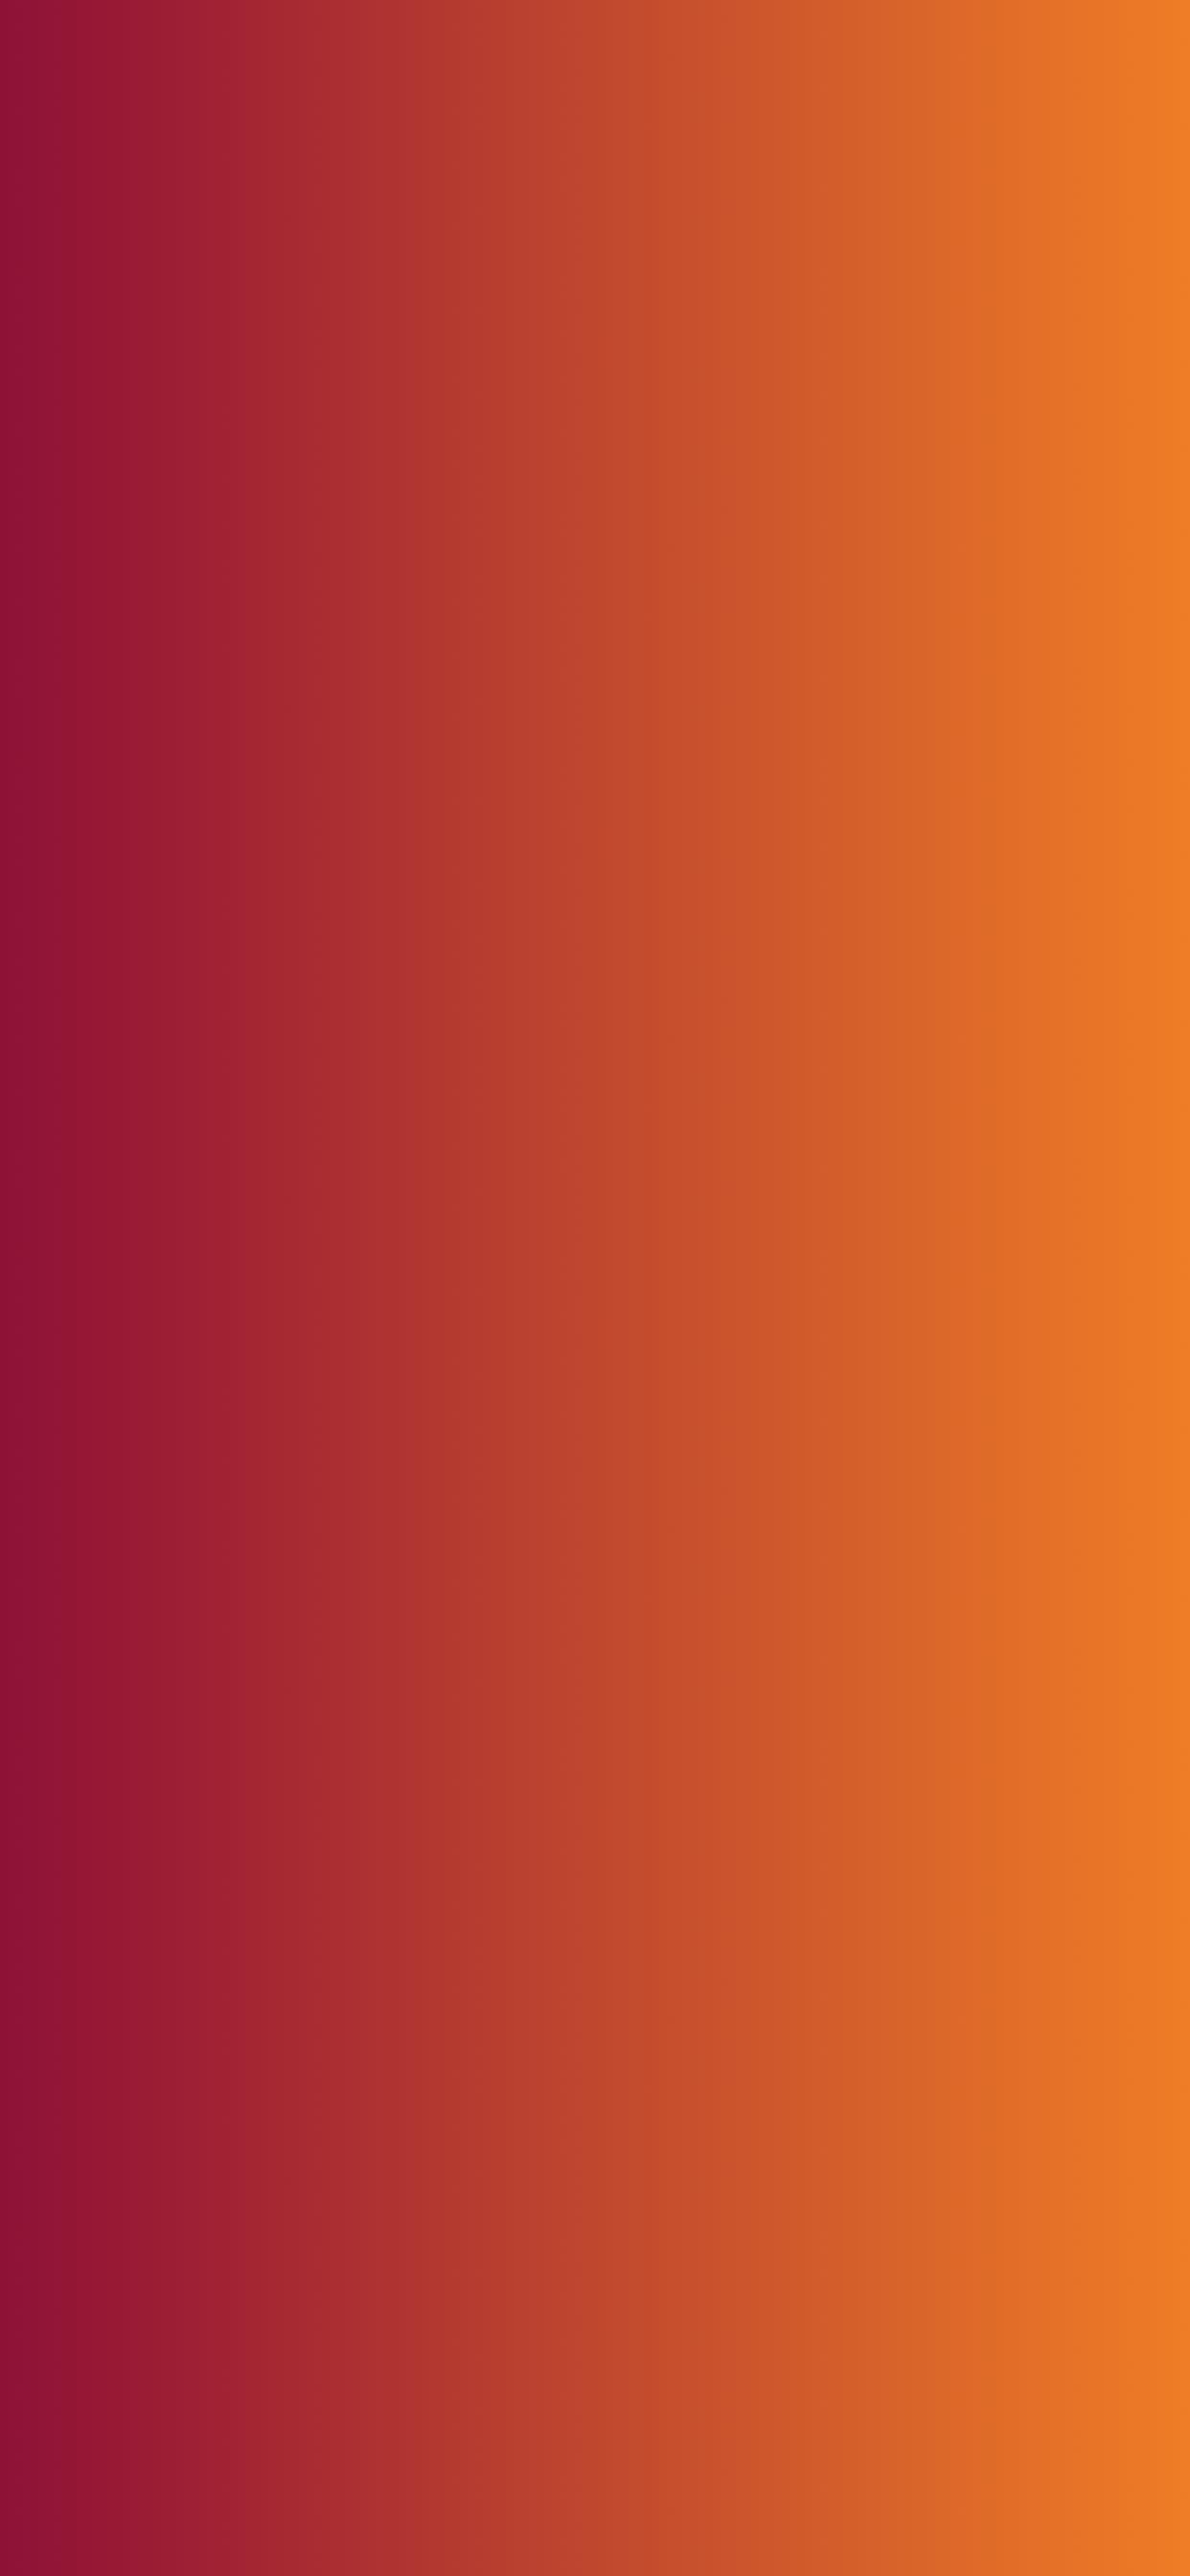 iPhone wallpaper gradient red orange Gradient colors